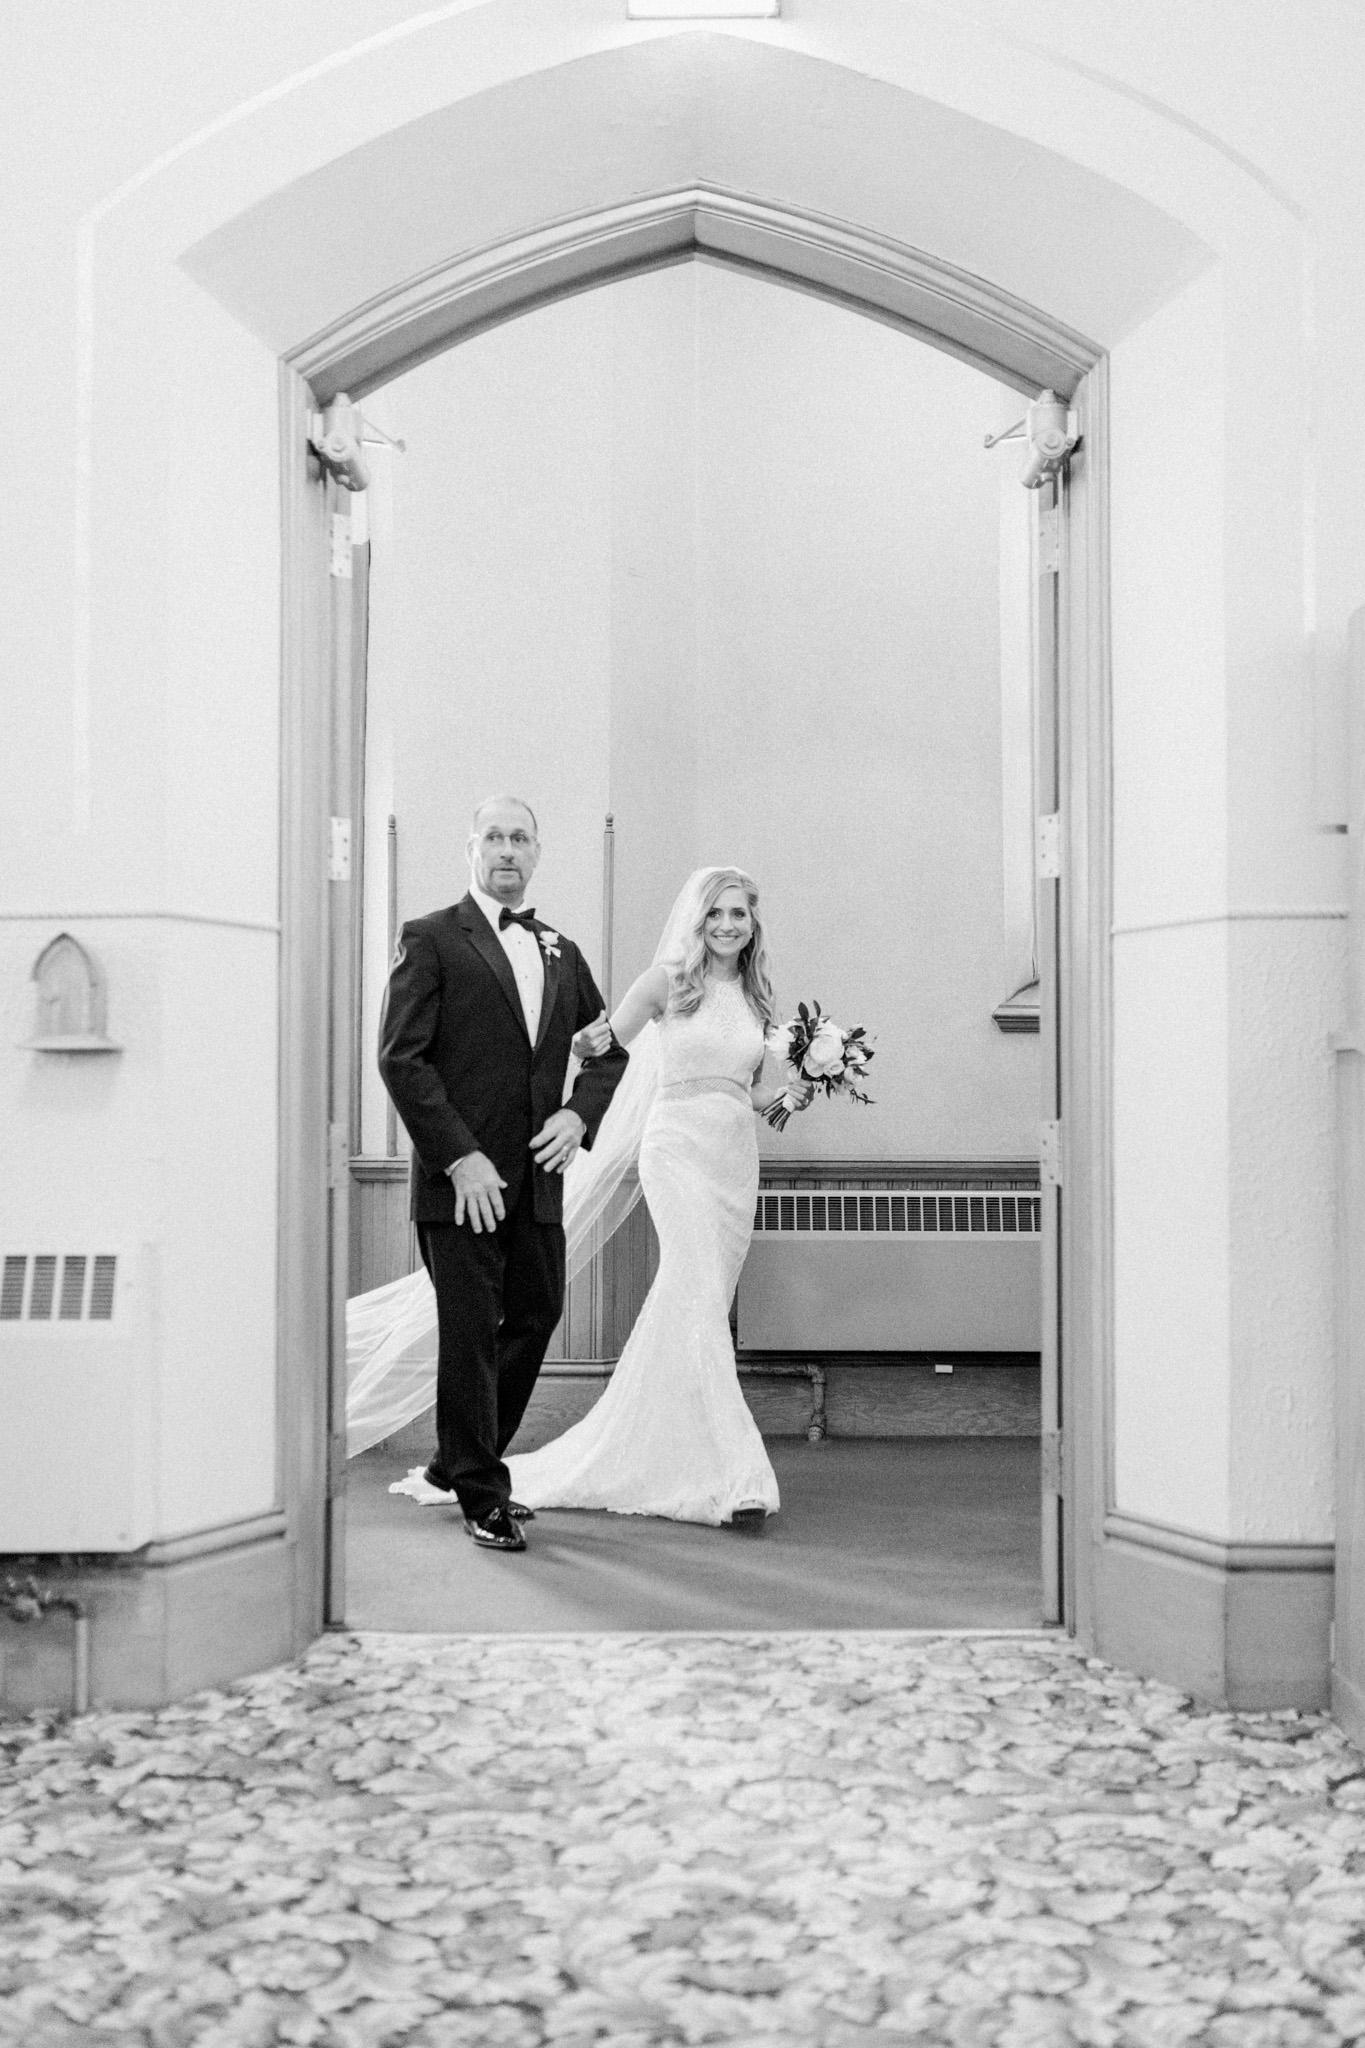 Elegant Blush Pink Country Club Wedding   Laurenda Marie Photography   Grand Rapids Michigan   West Michigan Wedding Photography